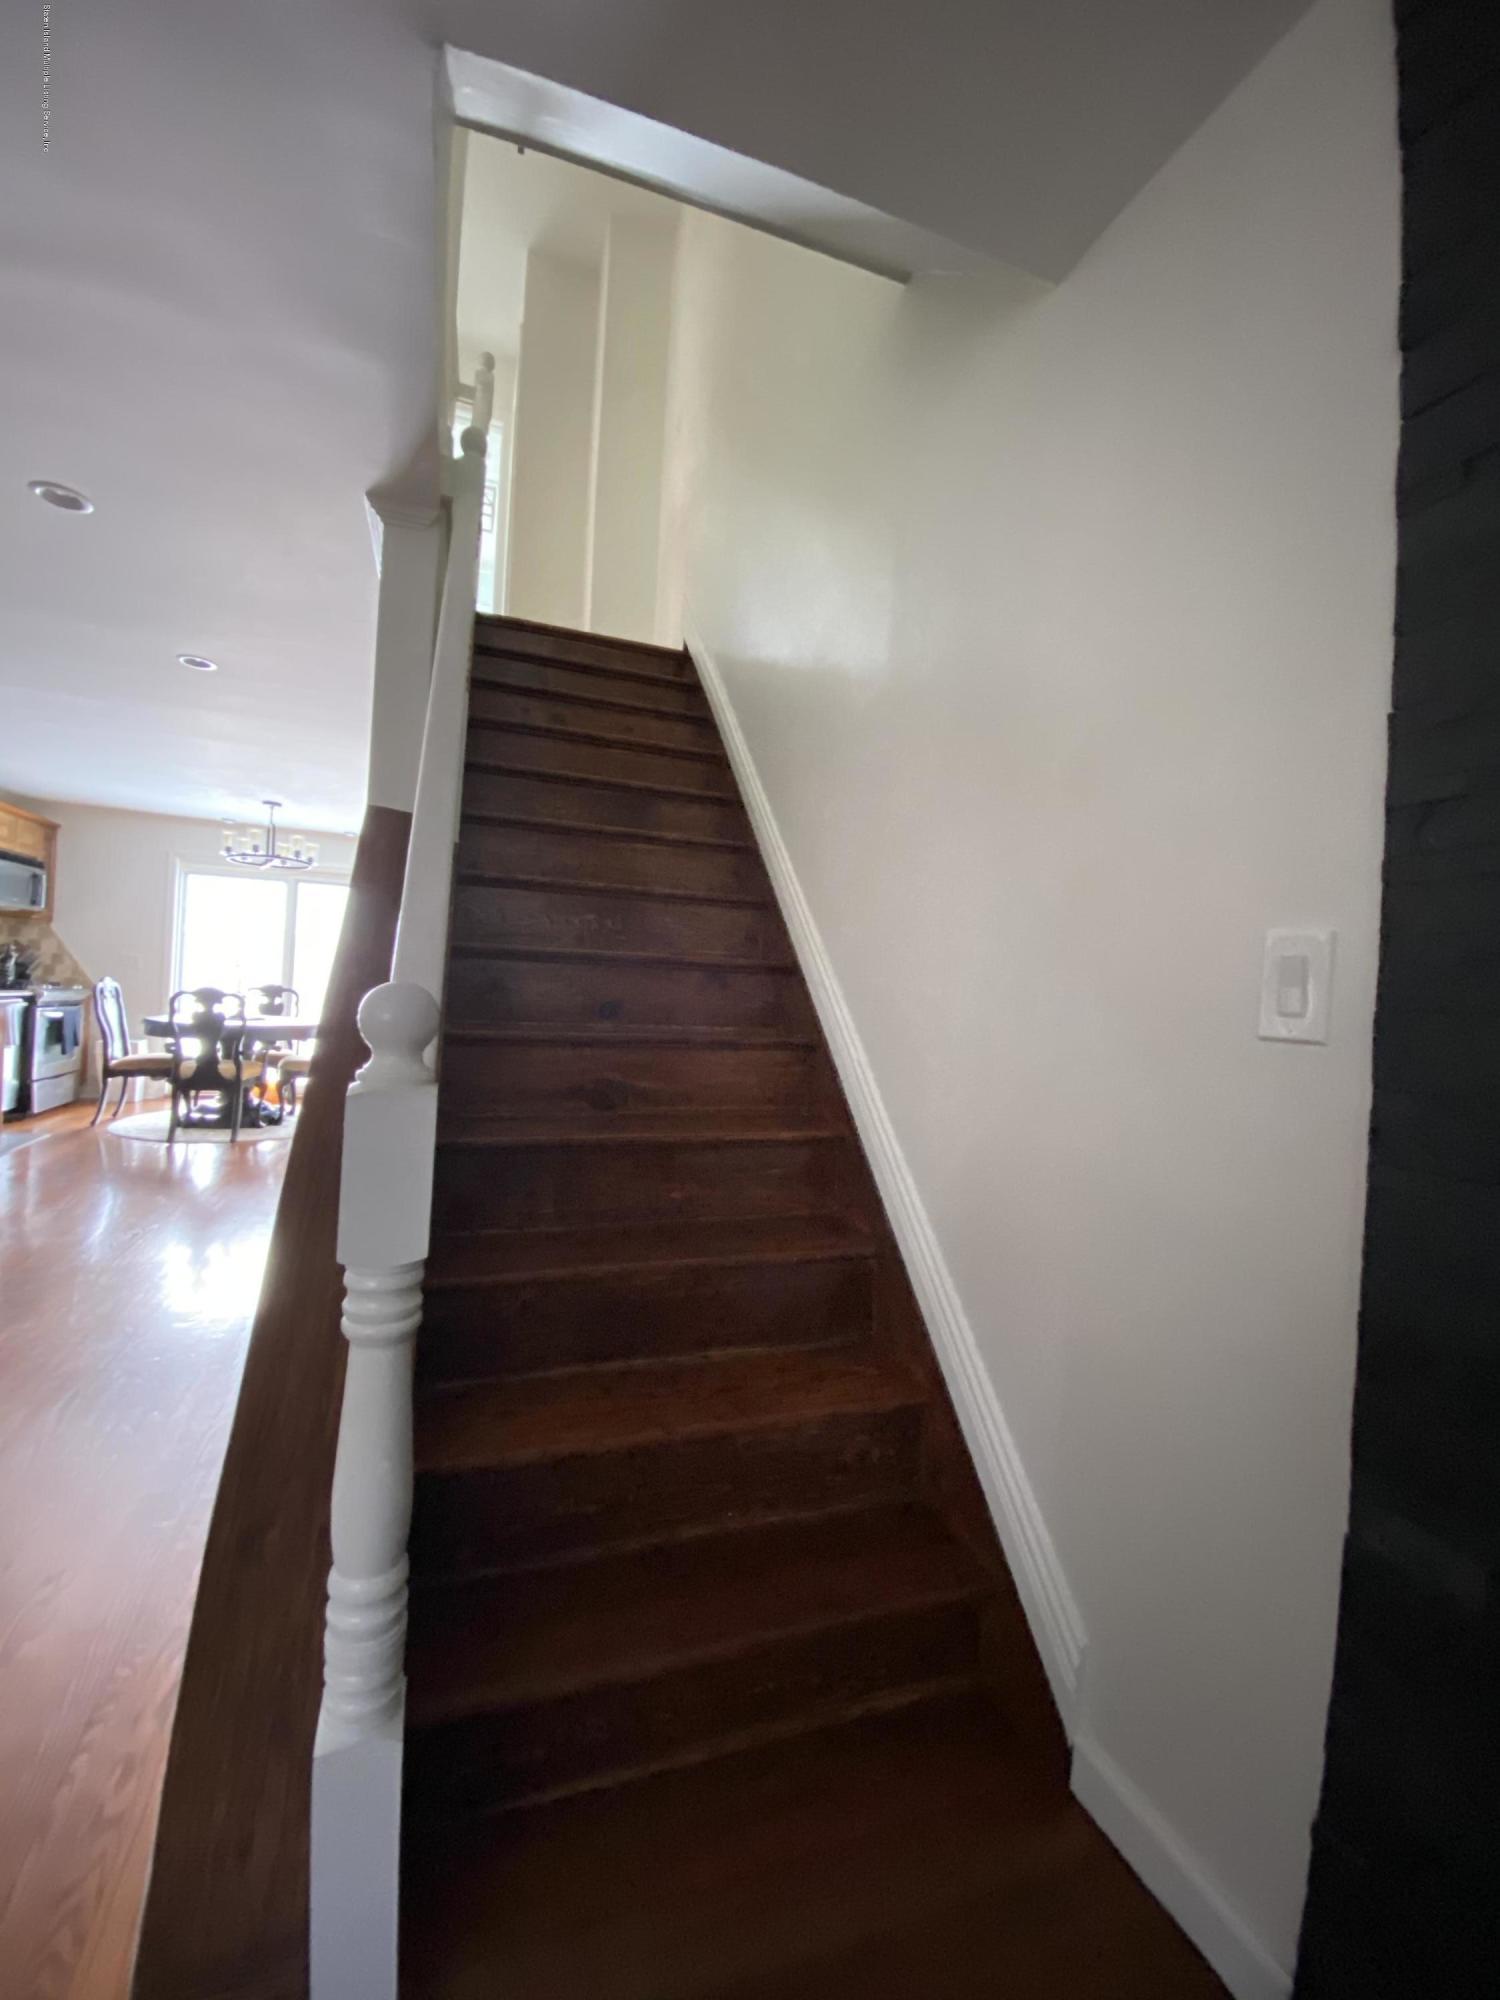 Single Family - Semi-Attached 370 Seaver Avenue  Staten Island, NY 10305, MLS-1136339-12